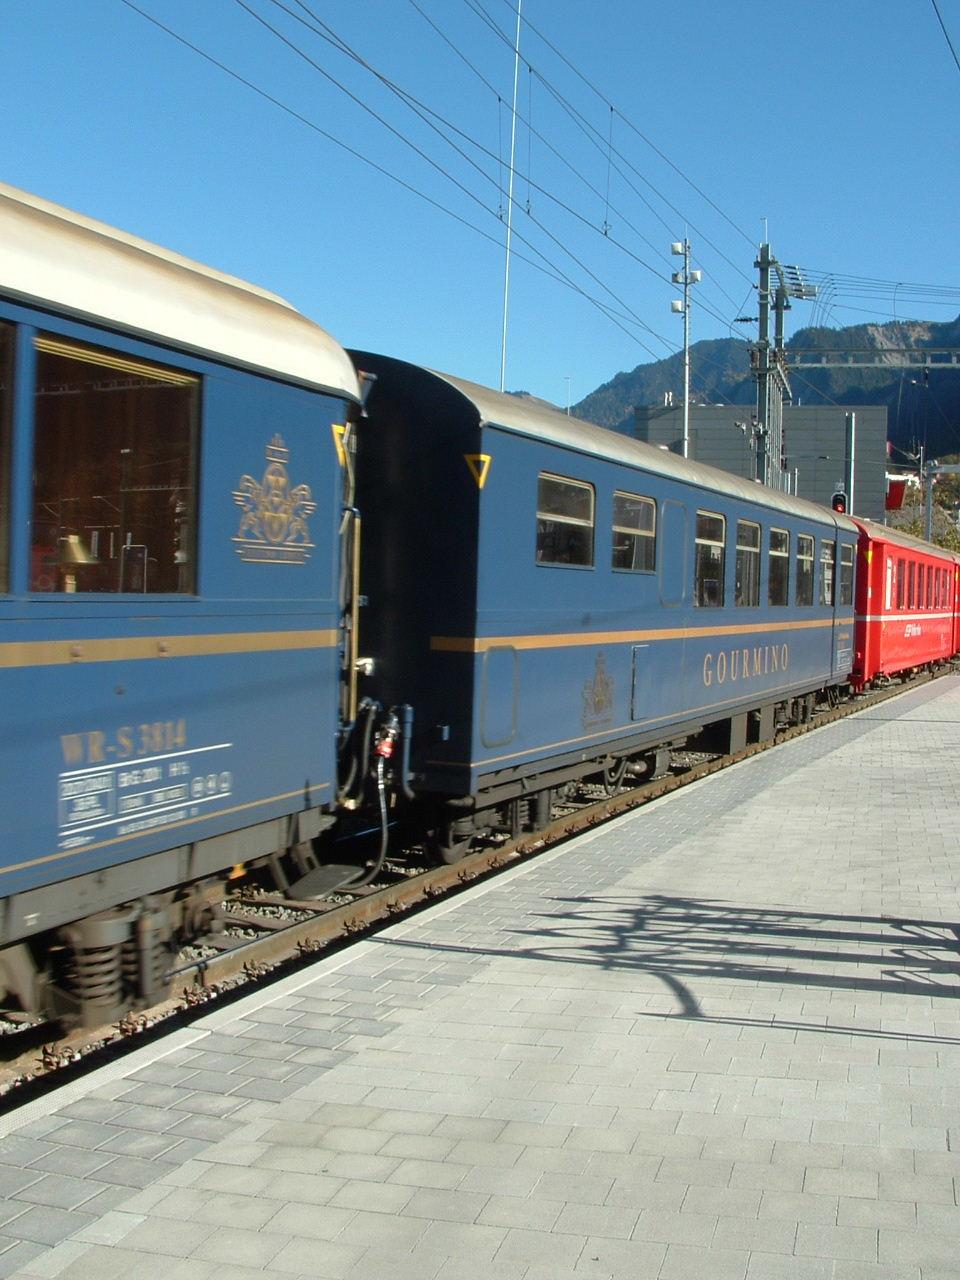 2005_Speisewagenfahrt Chur - St. Moritz